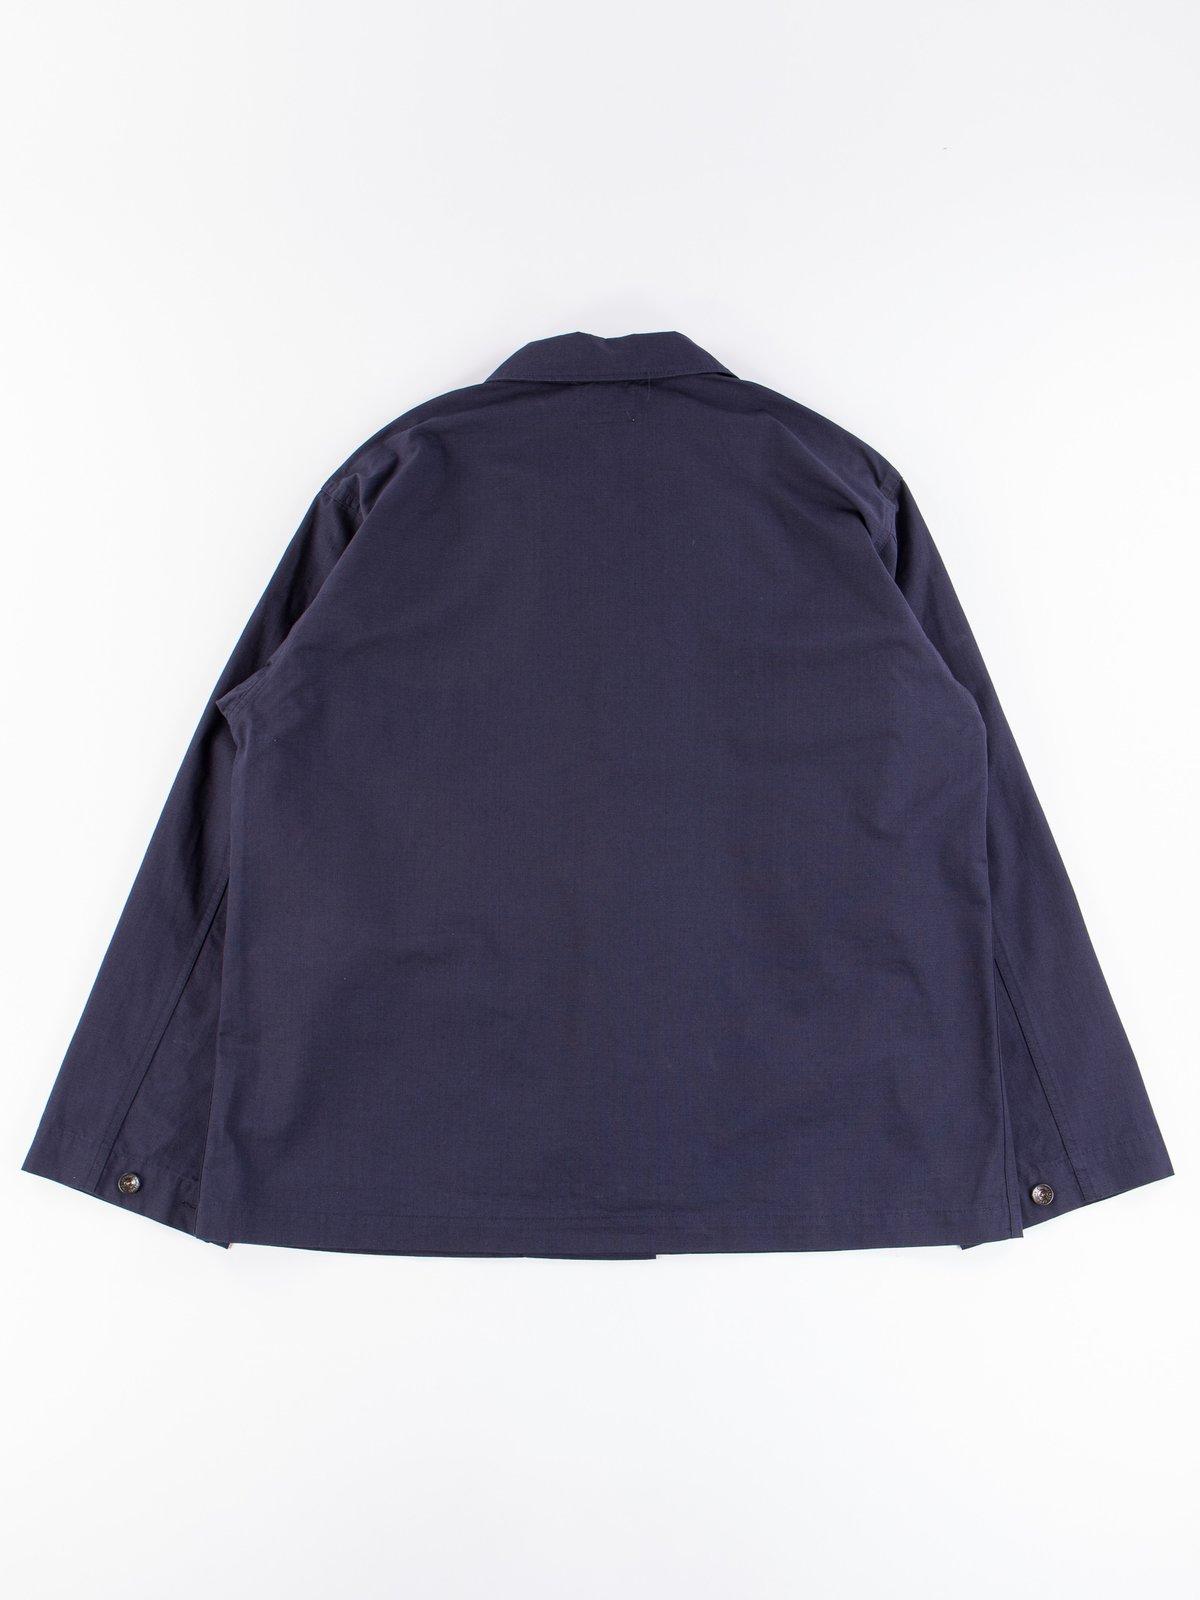 Dark Navy Cotton Ripstop M43/2 Shirt Jacket - Image 9